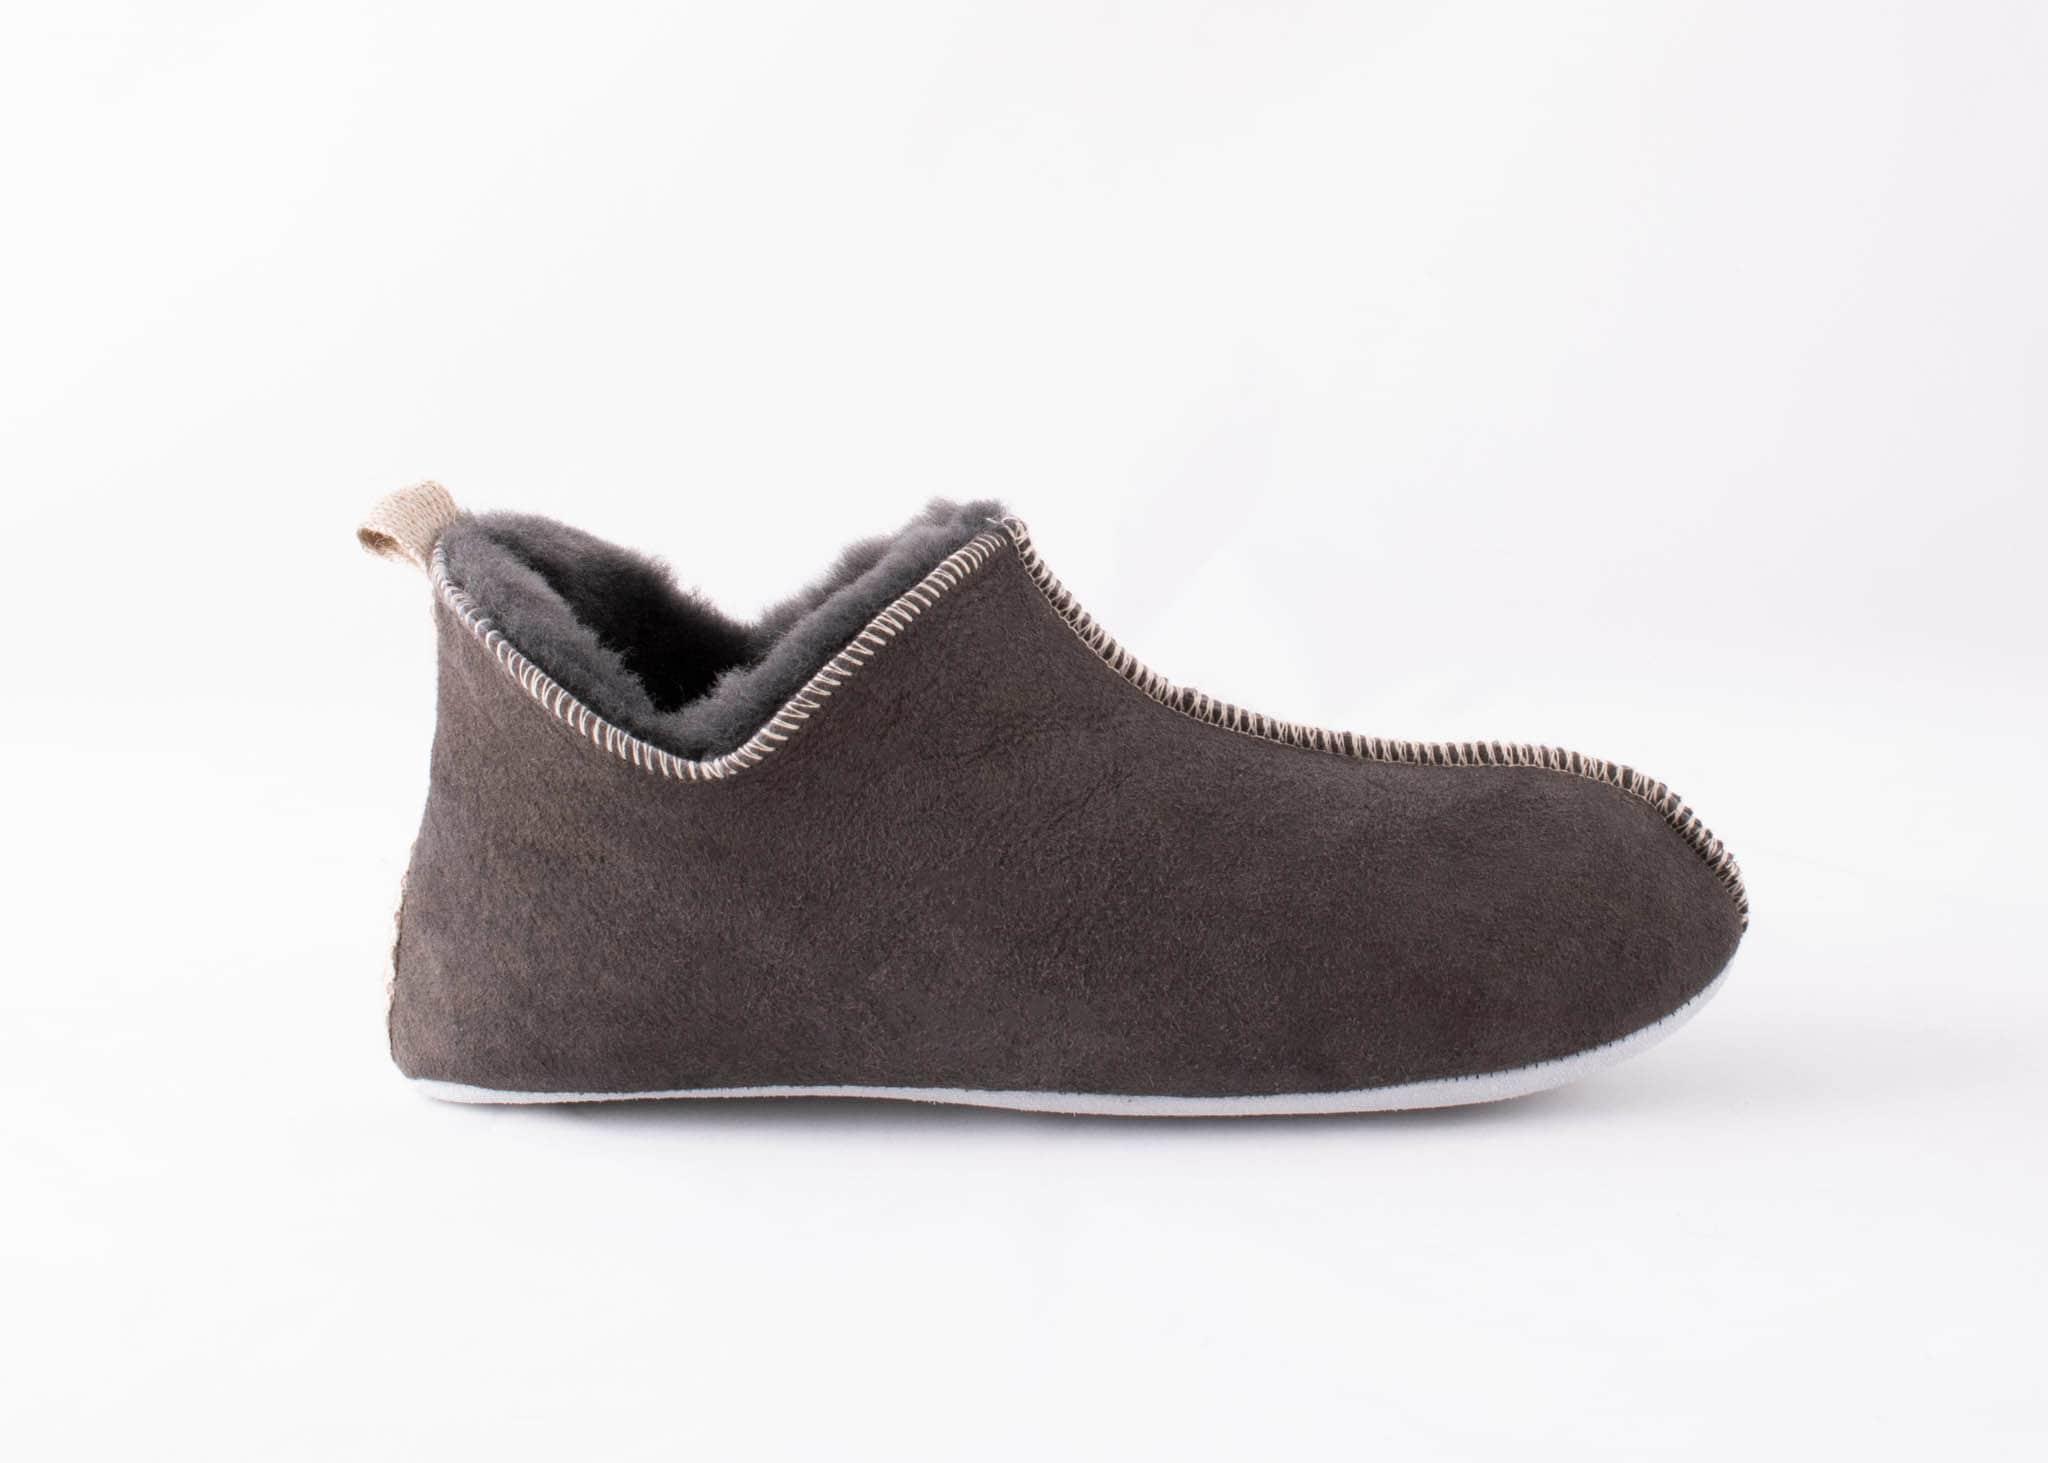 Molly sheepskin slippers